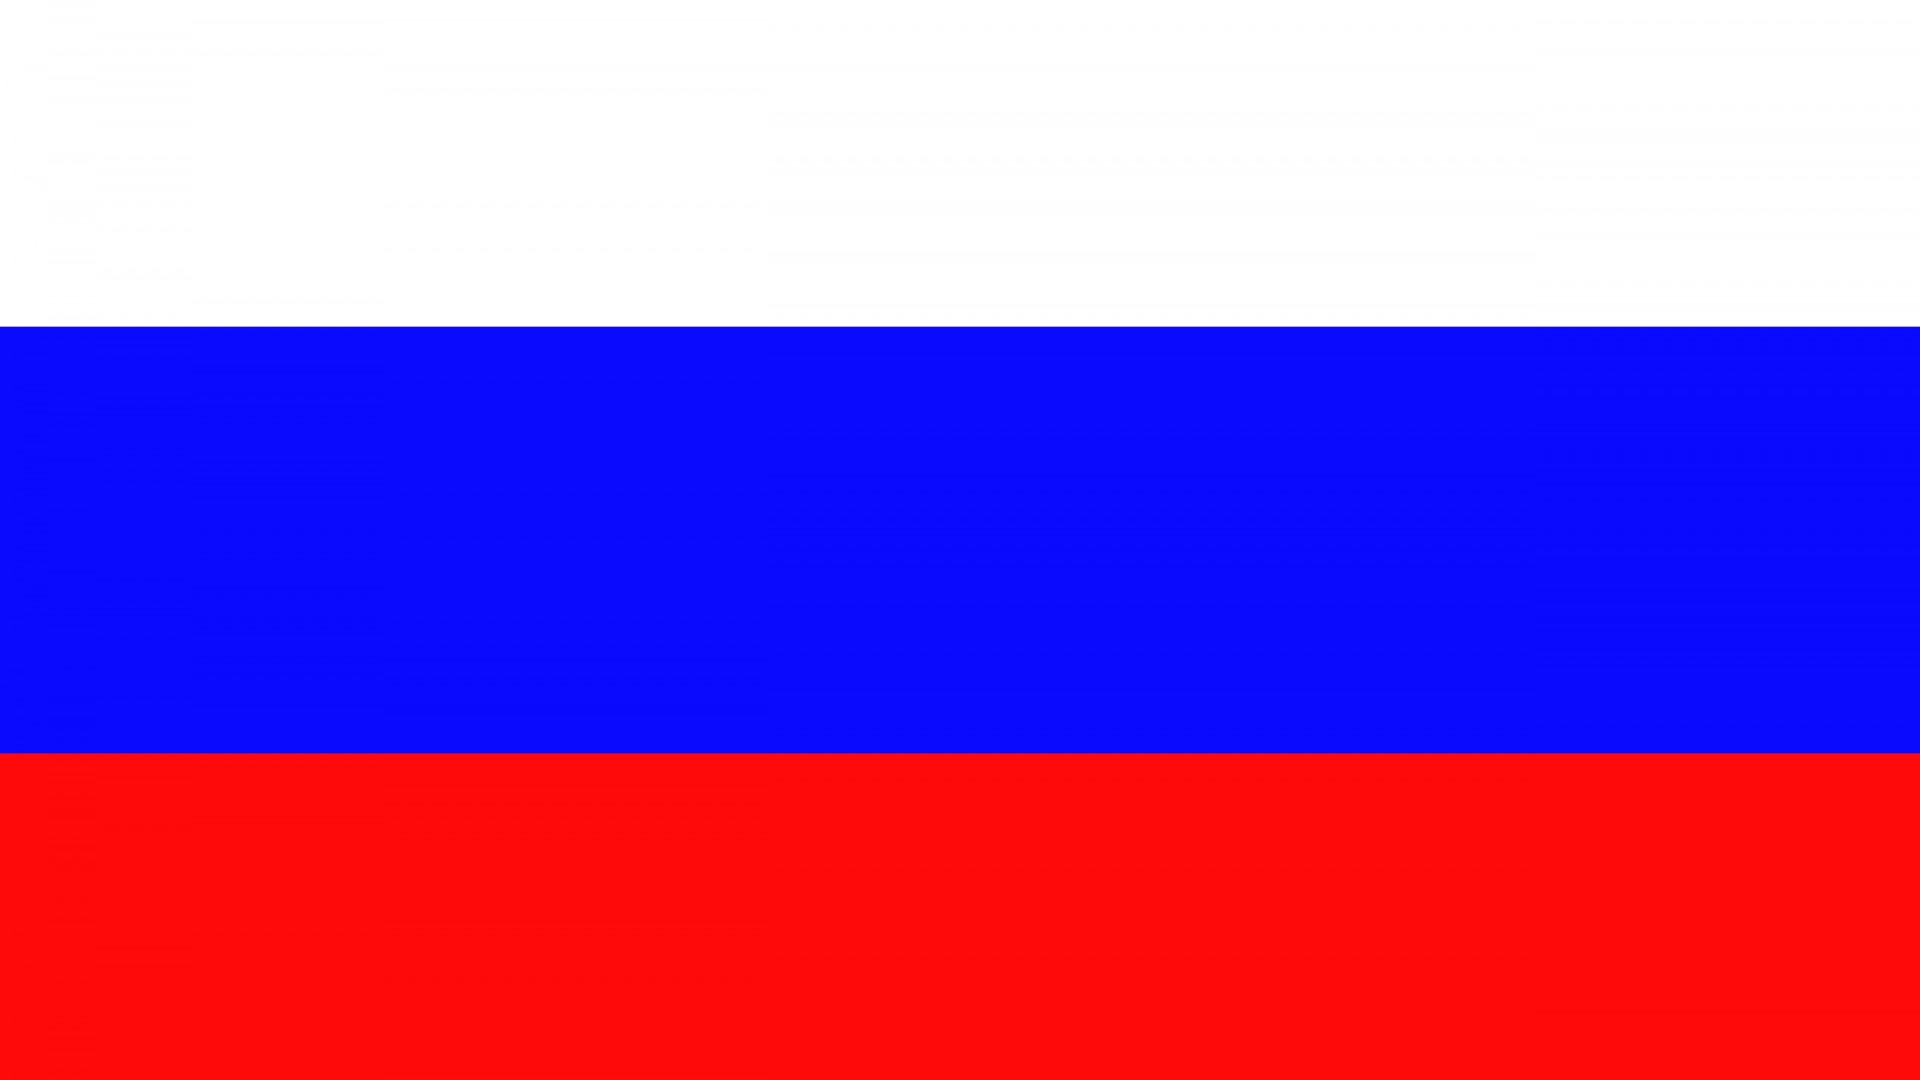 47 russian flag wallpaper background on wallpapersafari